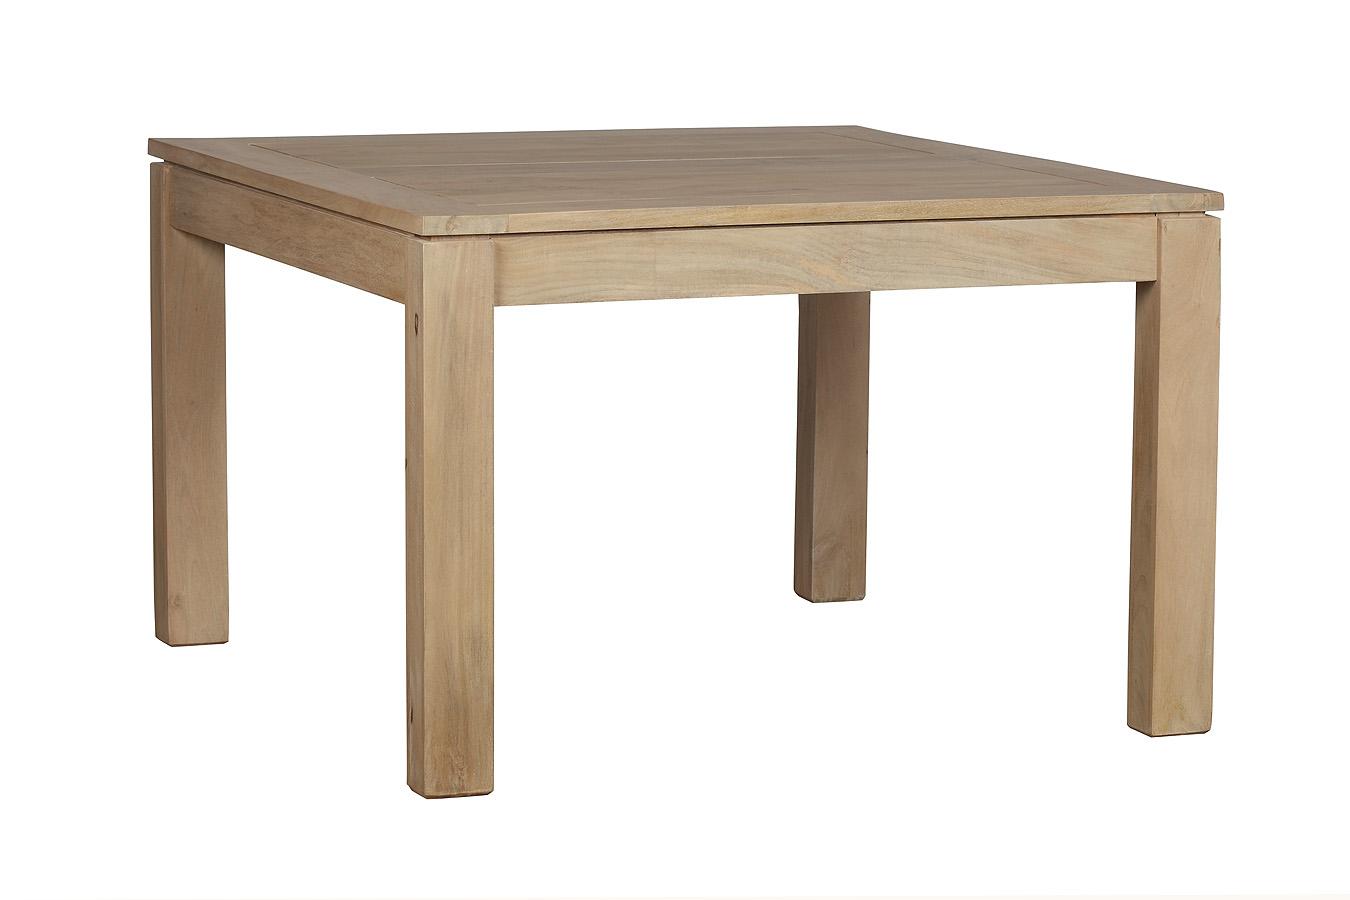 Table A Manger Carree Extensible.Table De Repas Carree Extensible En Manguier 120 200x120x78cm Boreal Clair